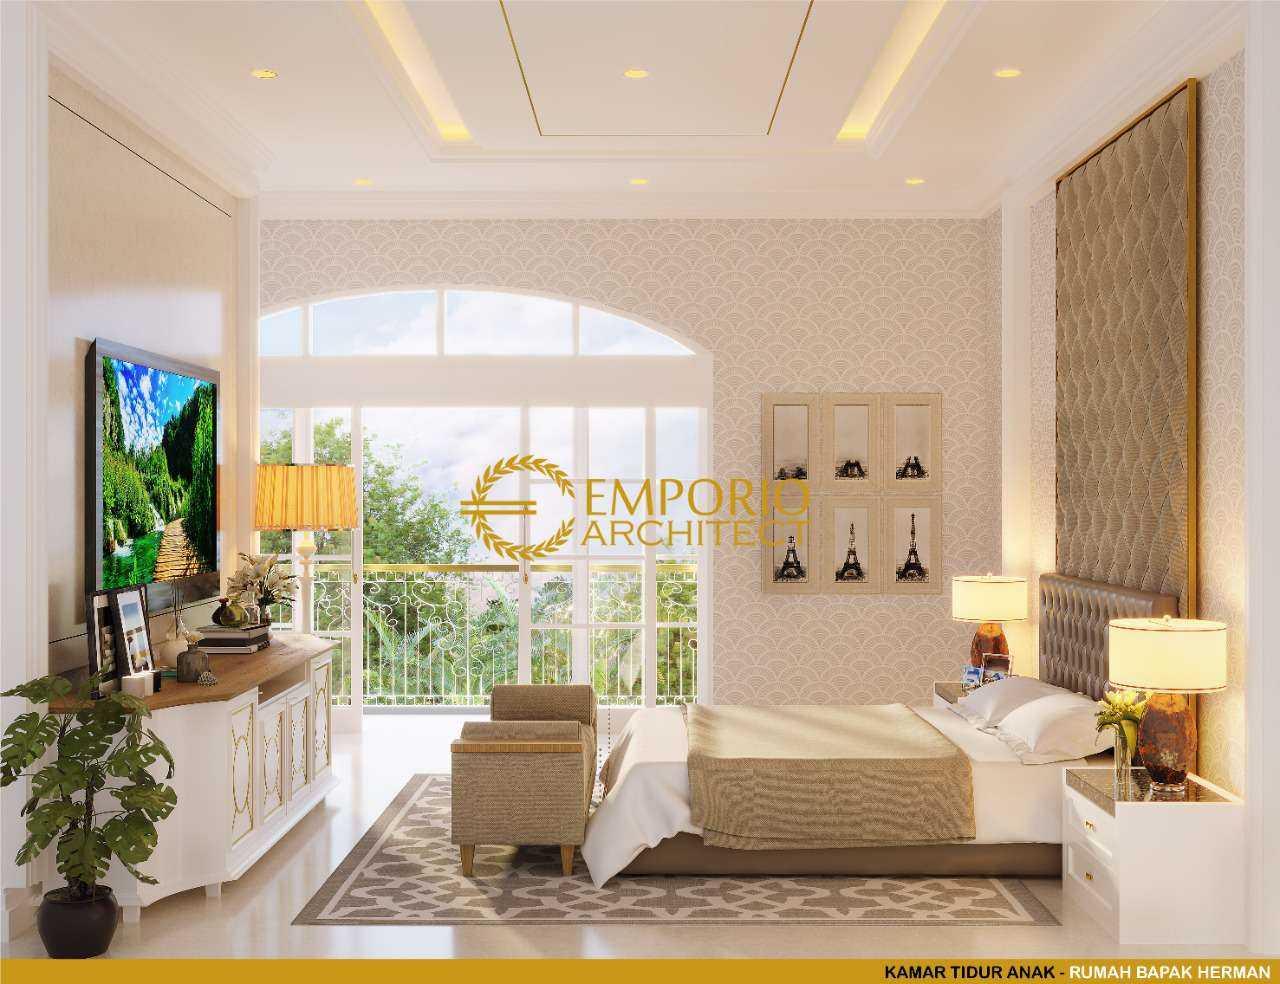 Emporio Architect Jasa Arsitek Denpasar Desain Rumah Classic 3 Lantai 772 @ Denpasar, Bali Kota Denpasar, Bali, Indonesia Kota Denpasar, Bali, Indonesia Emporio-Architect-Jasa-Arsitek-Denpasar-Desain-Rumah-Classic-3-Lantai-350-Denpasar-Bali  94568